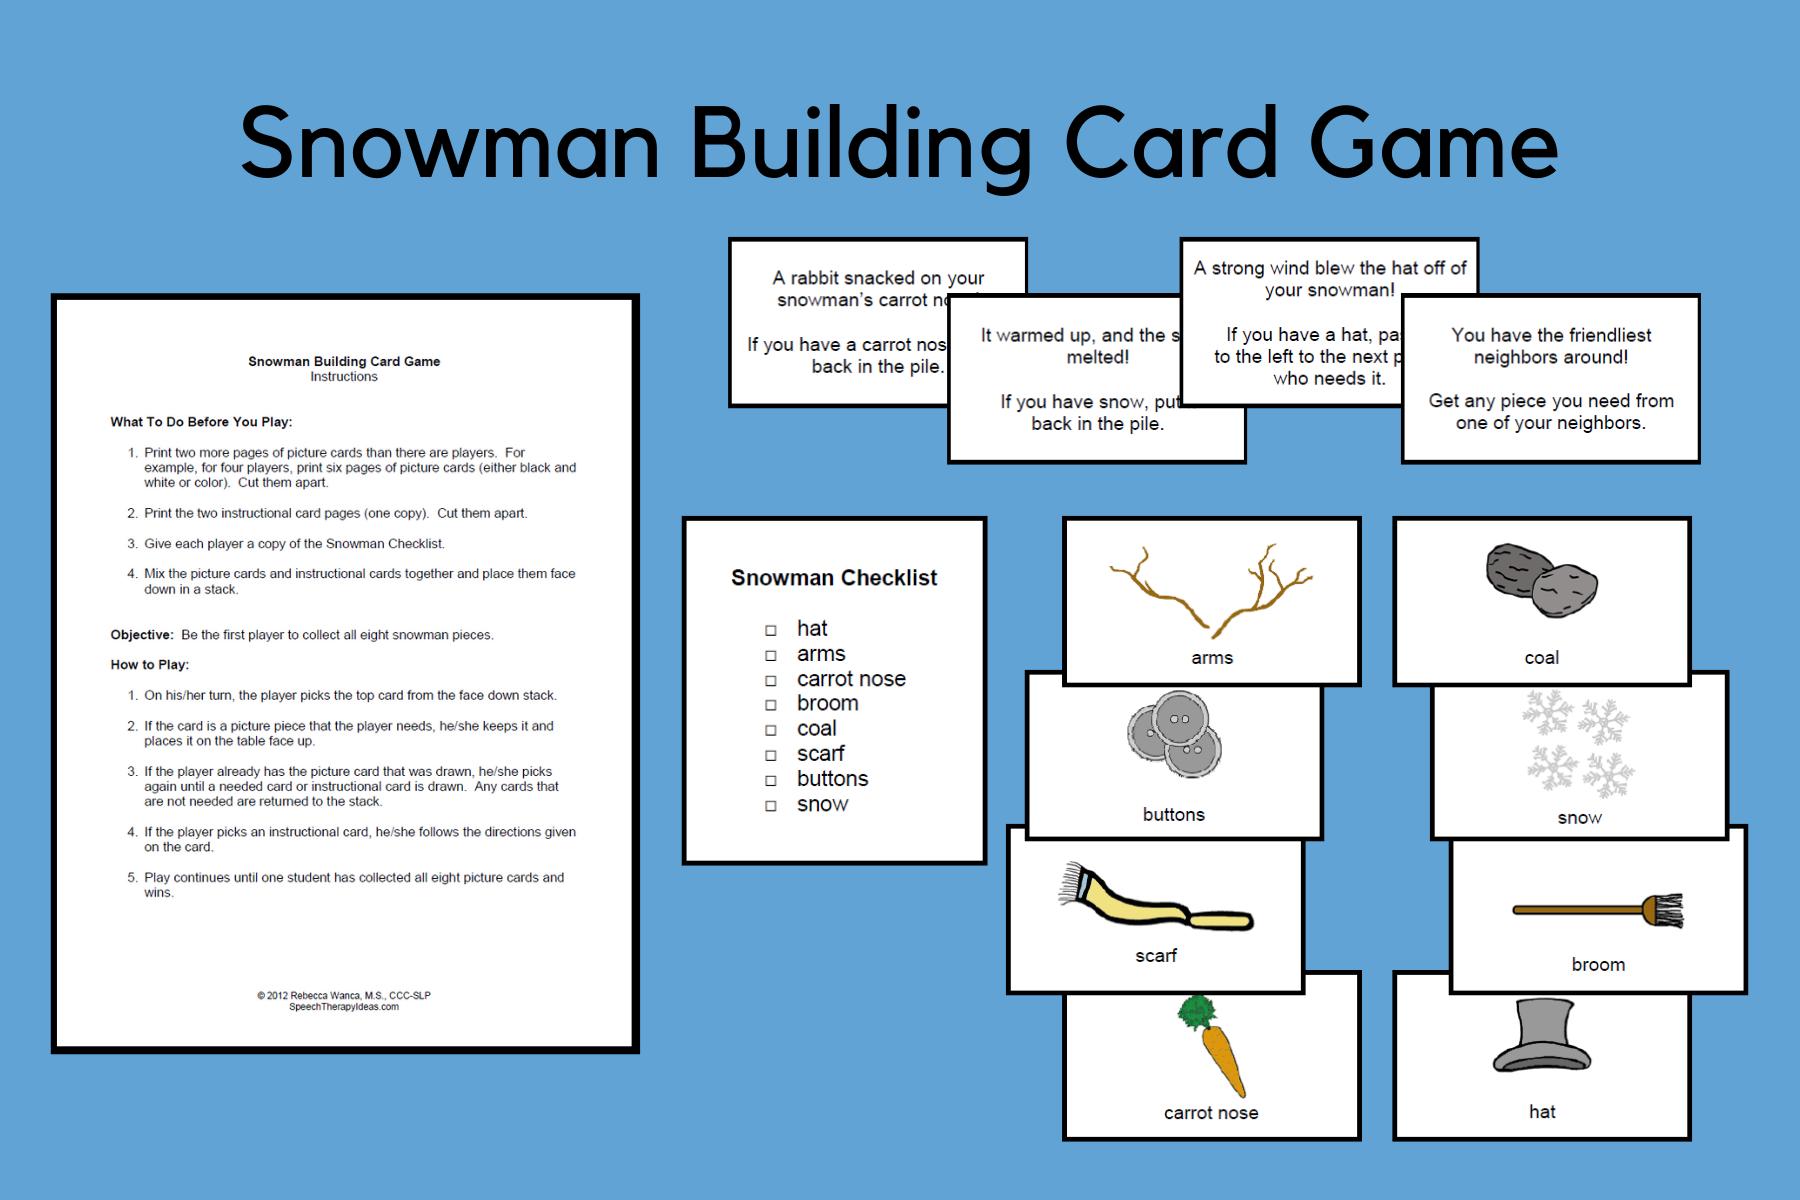 Snowman Building Card Game